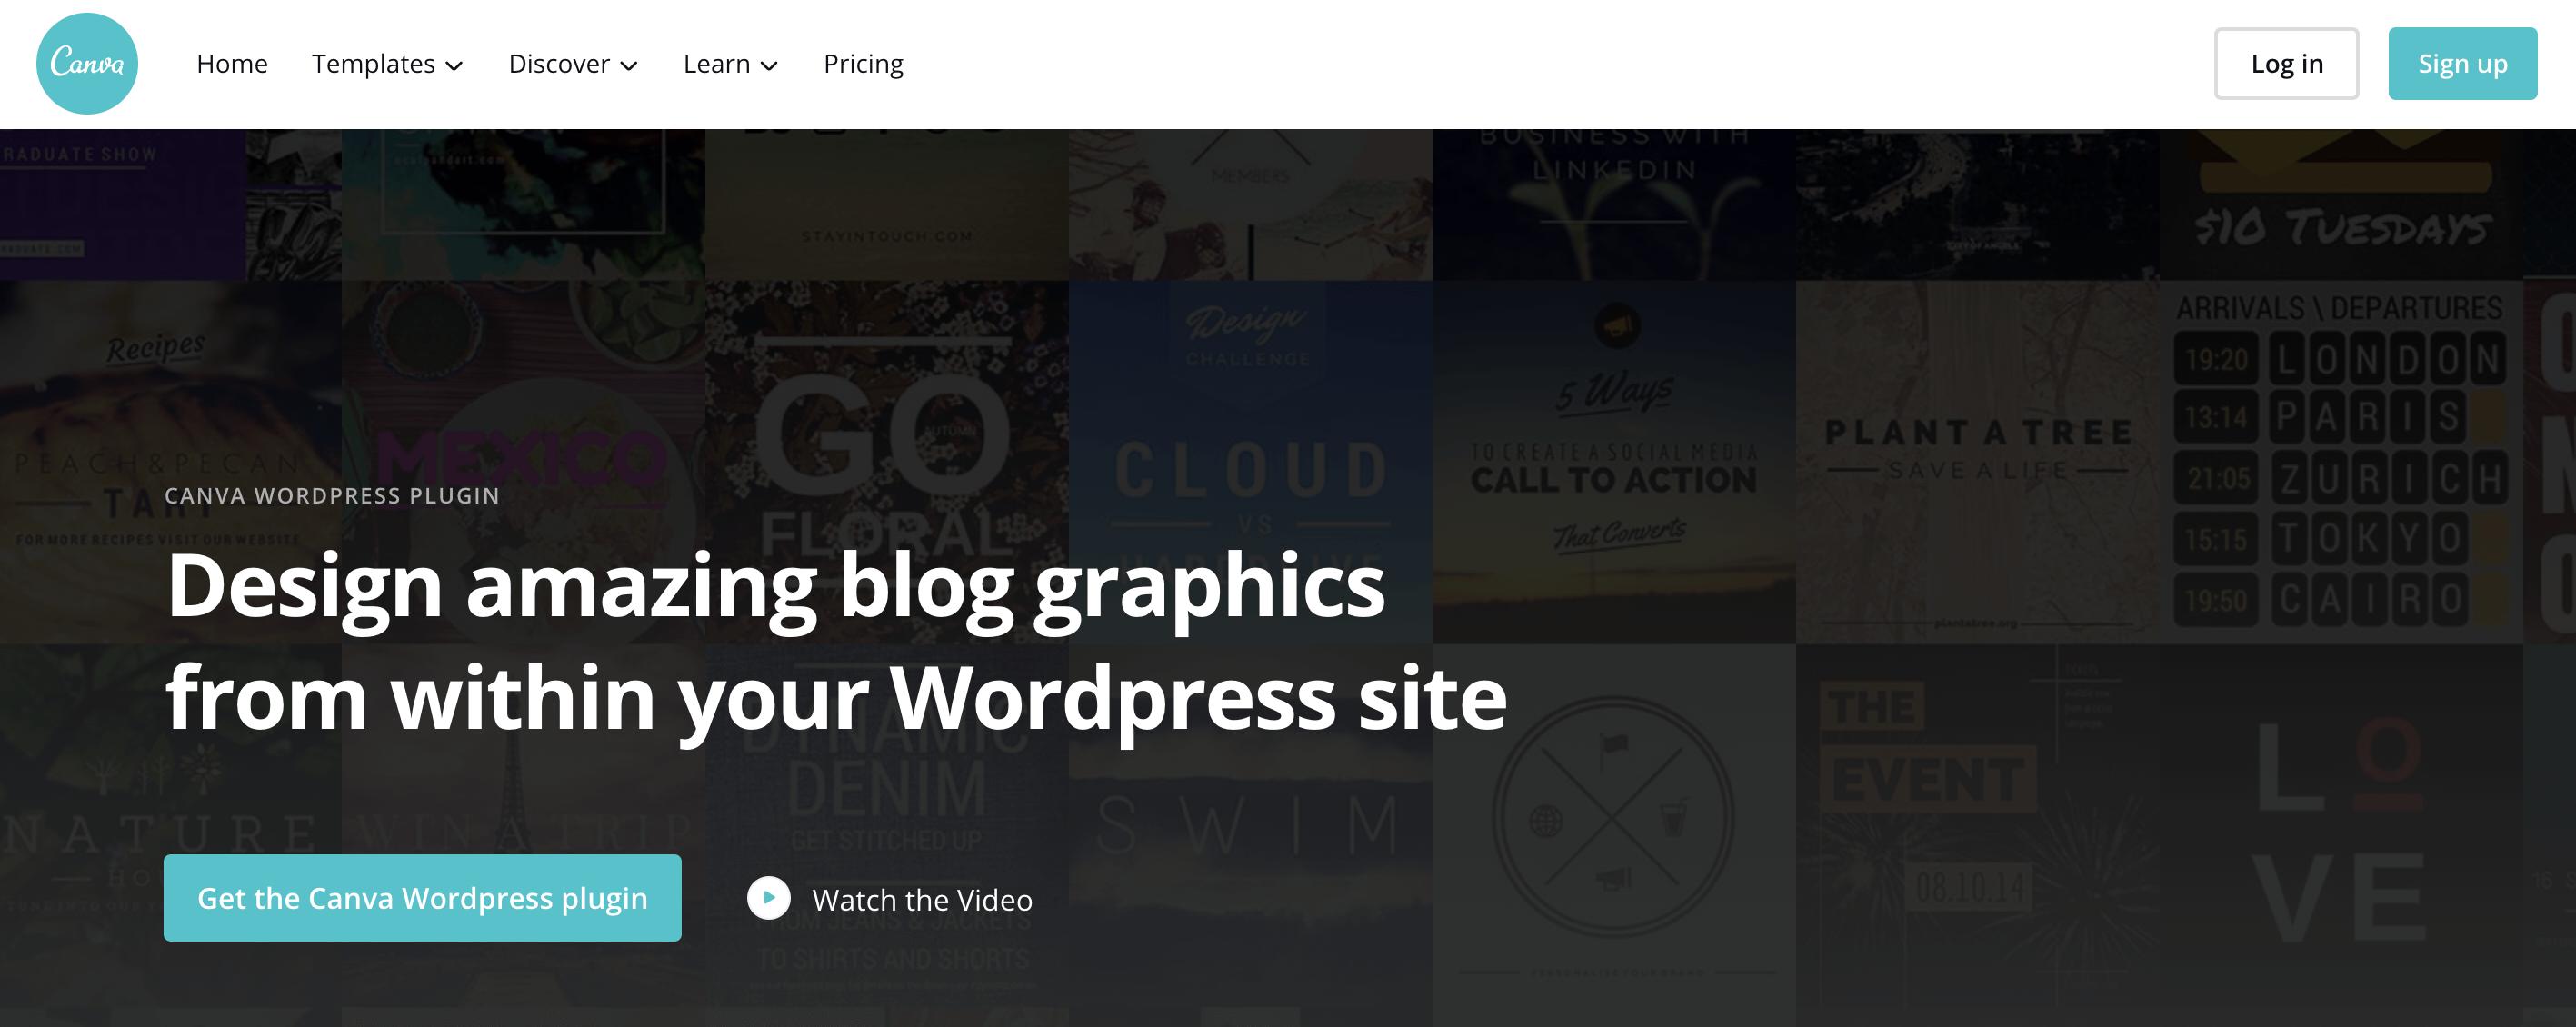 Canva WordPress plugin